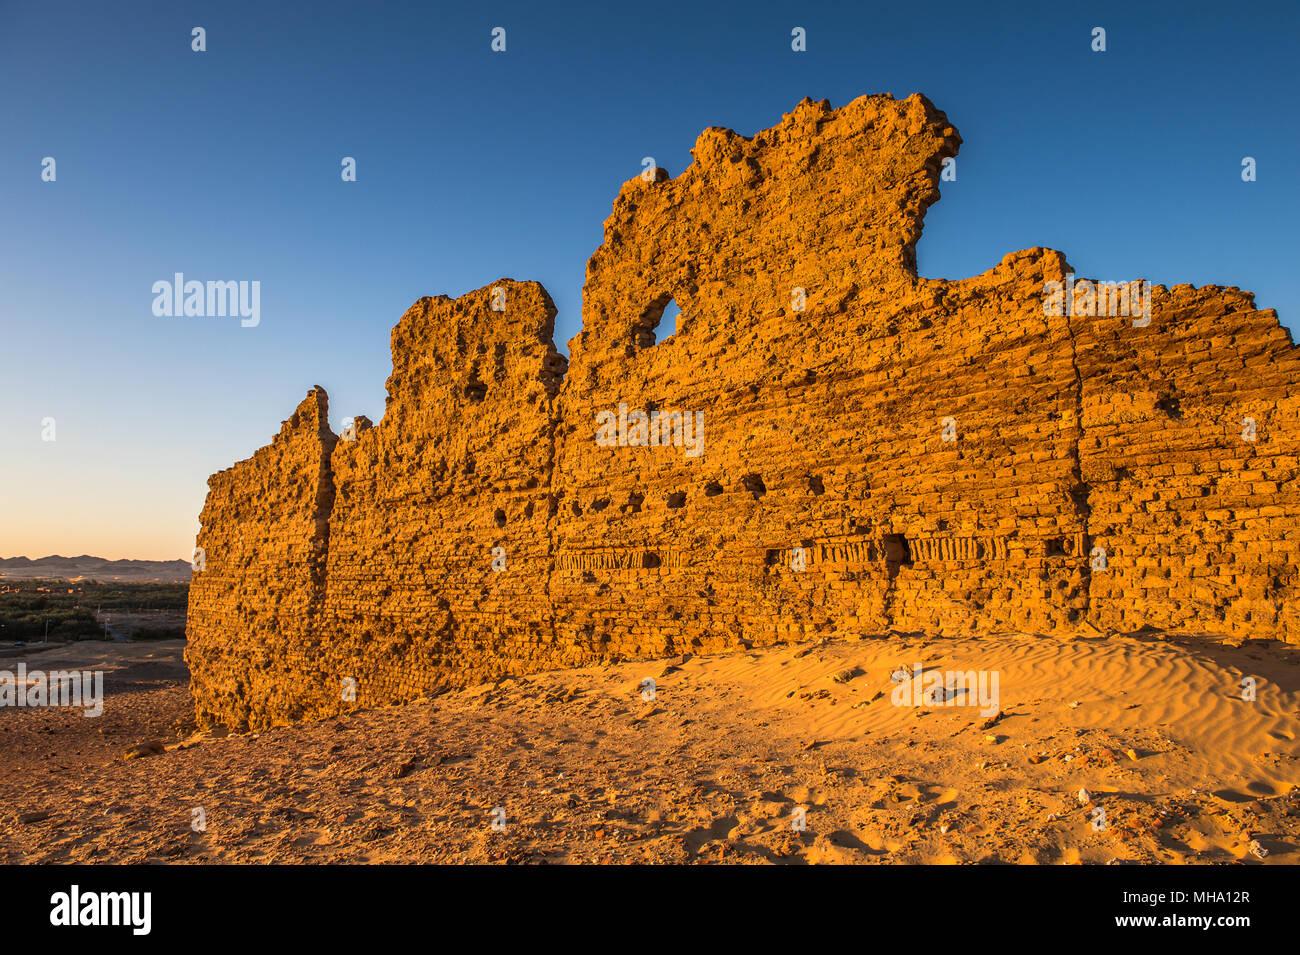 Rovine del tempio Nadora in Kharga deserto d'Egitto Foto Stock